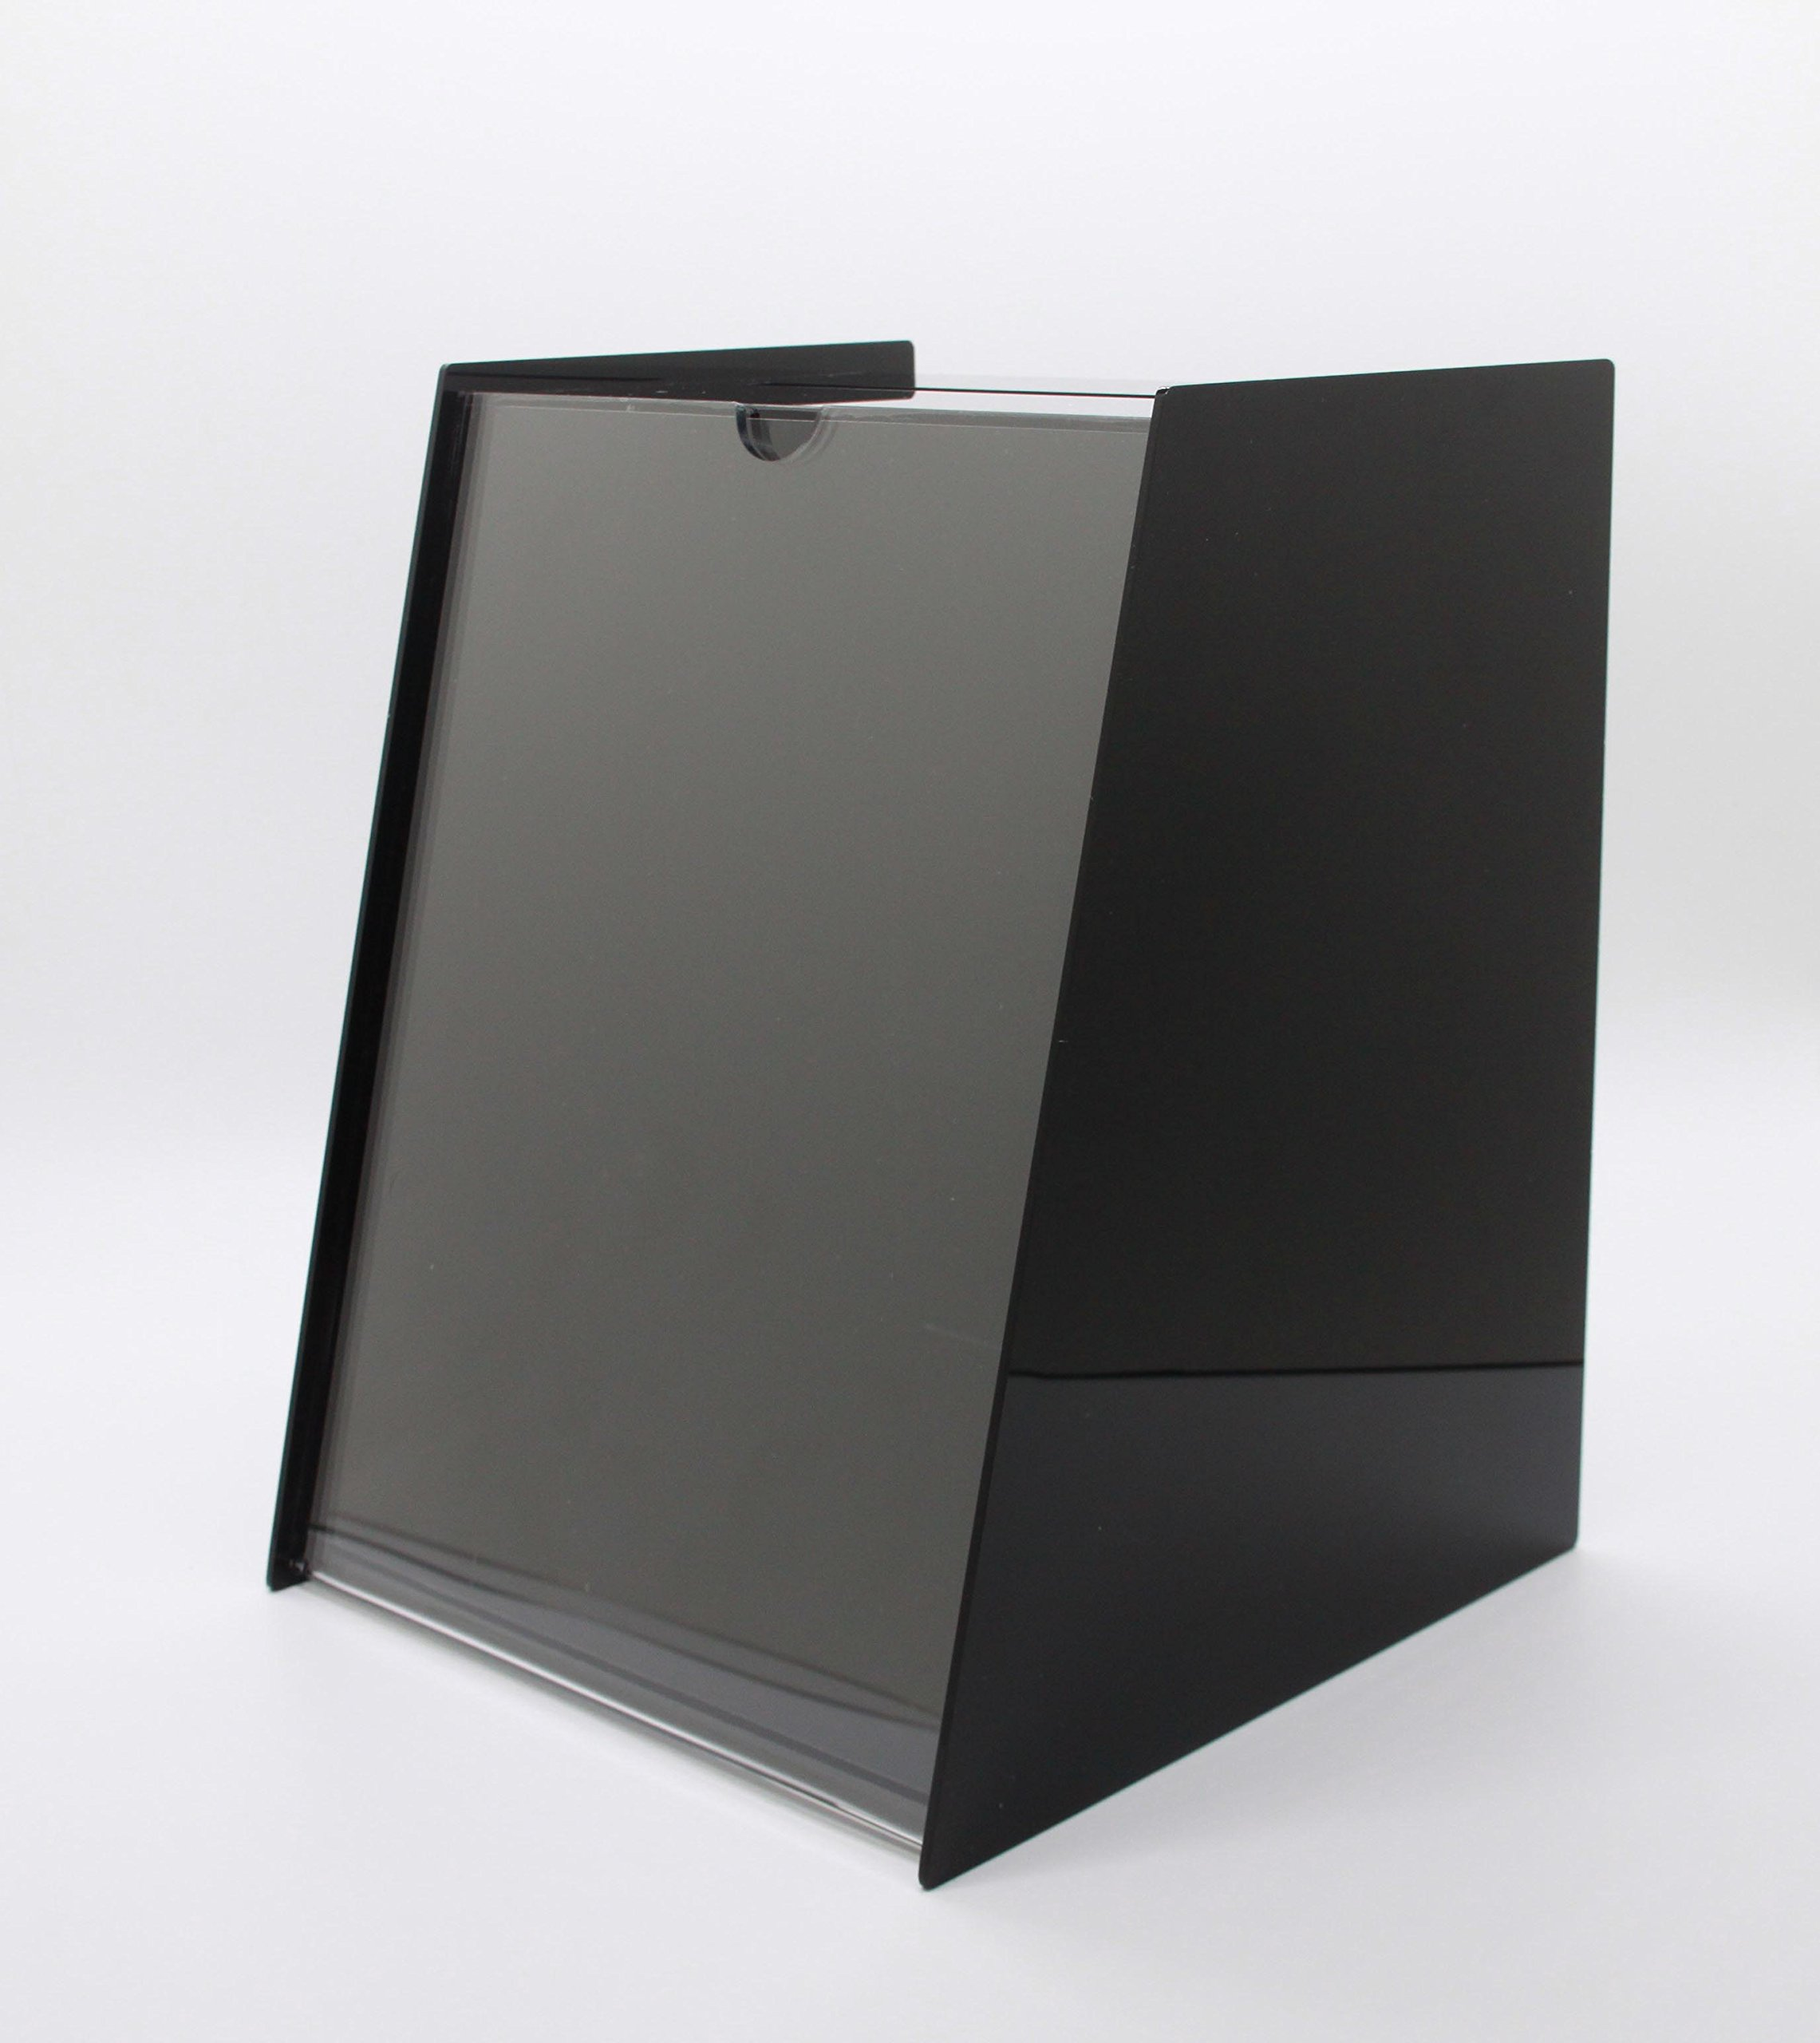 Fixture Display 8.8''x11.0''x9.0'' Acrylic Ballot Box with 8.5 x 11 Sign Holder Pen-Black 19228-NF